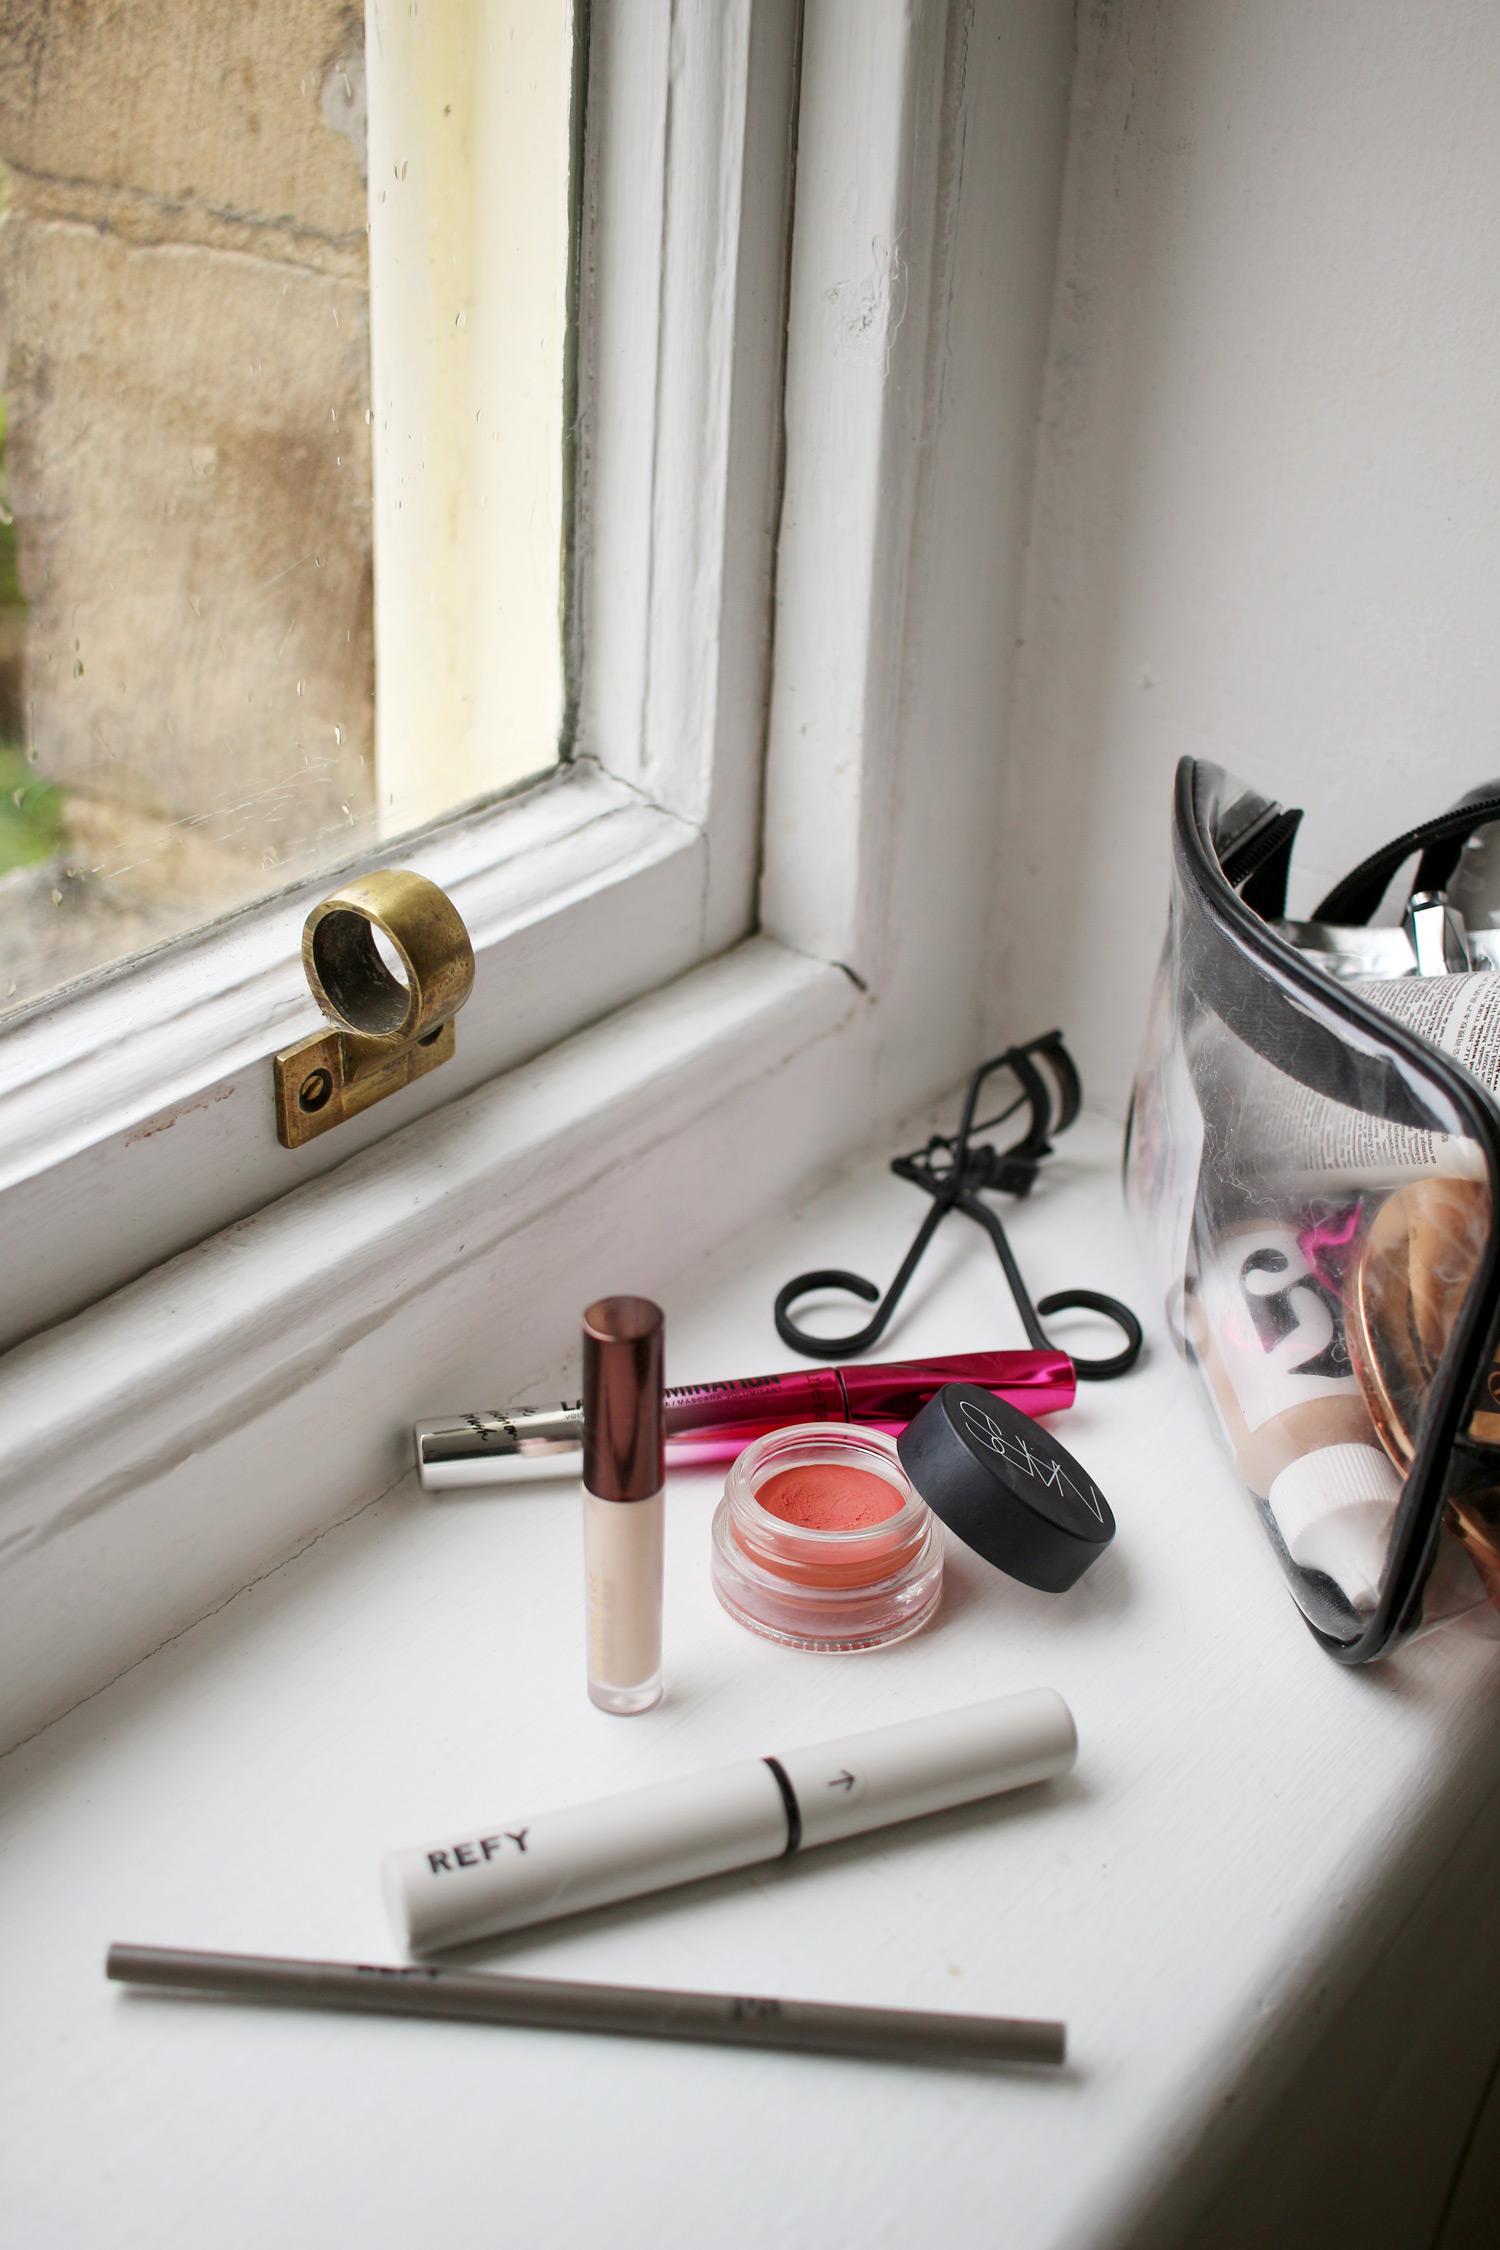 makeup-bag-favourites-nars-air-blush-refy-beauty-eyebrow